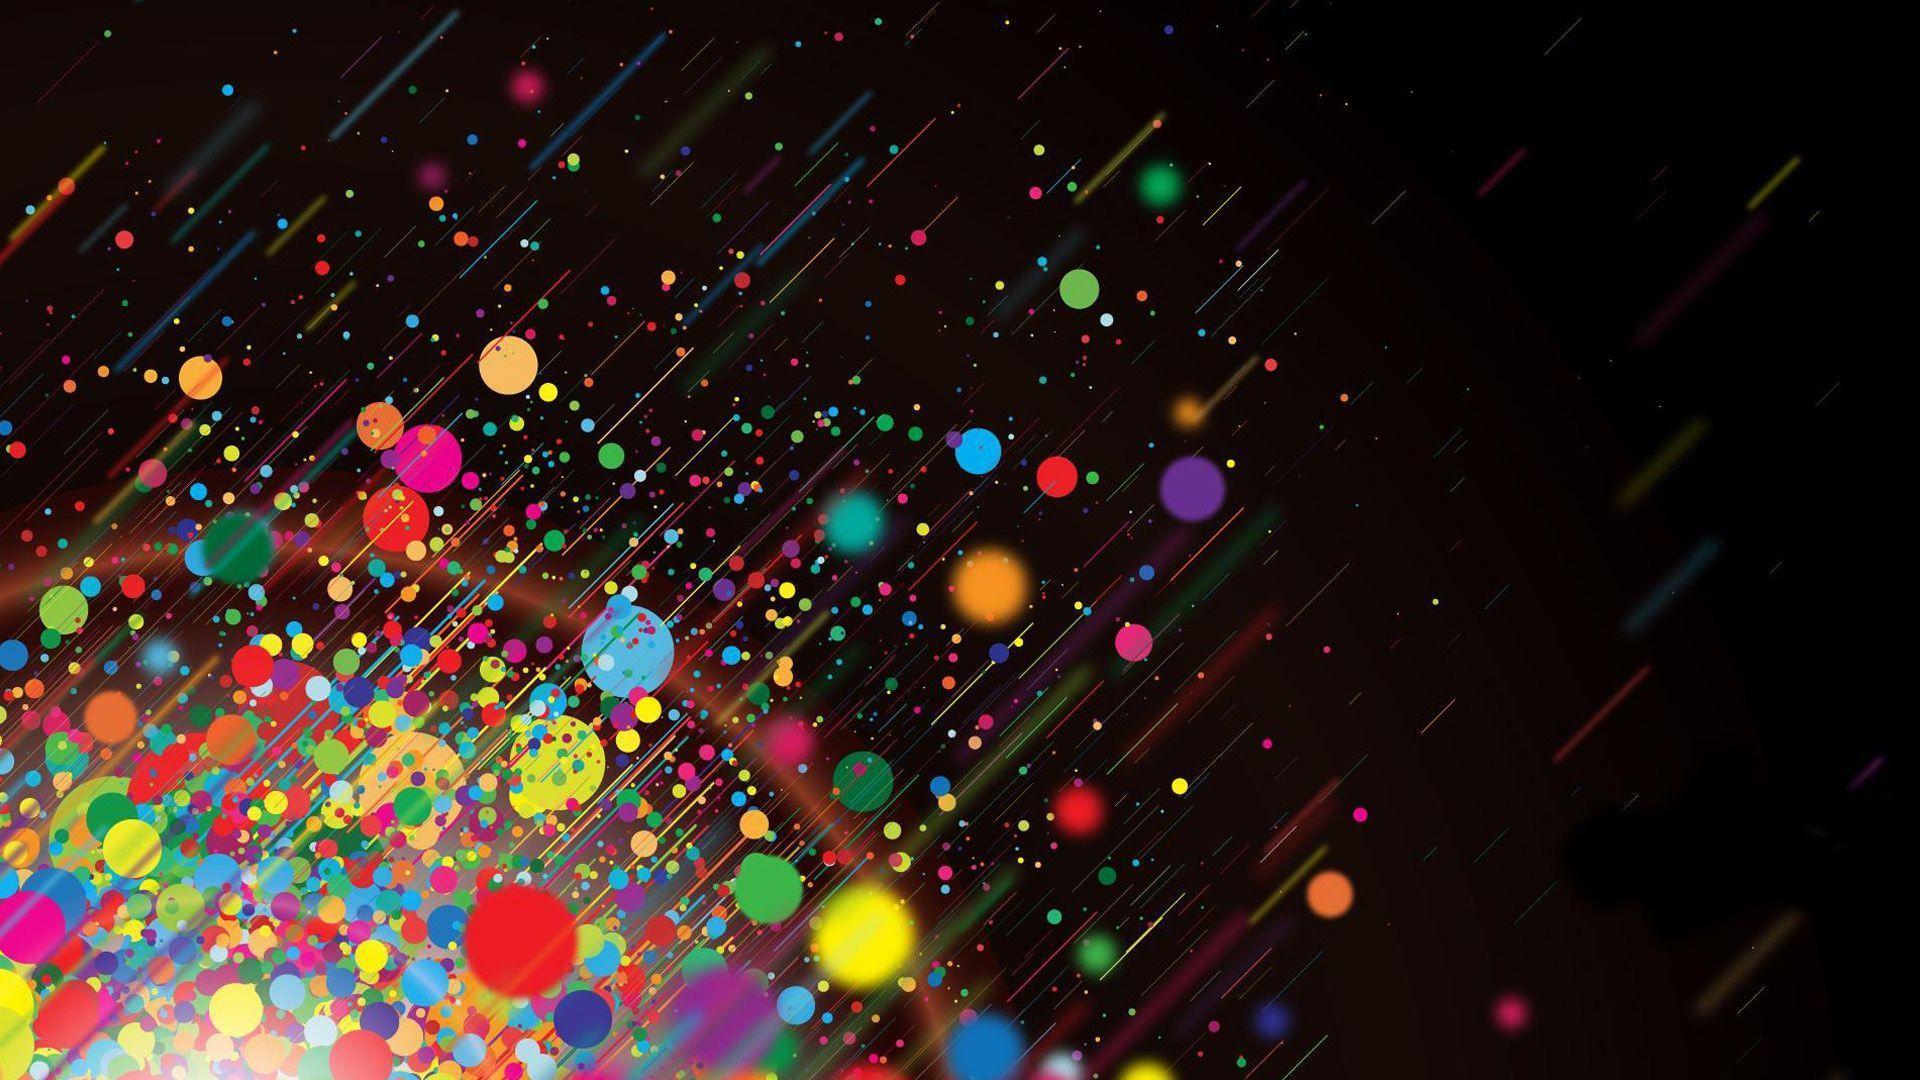 Neon Wallpapers Hd 19x1080 Wallpaper Cave